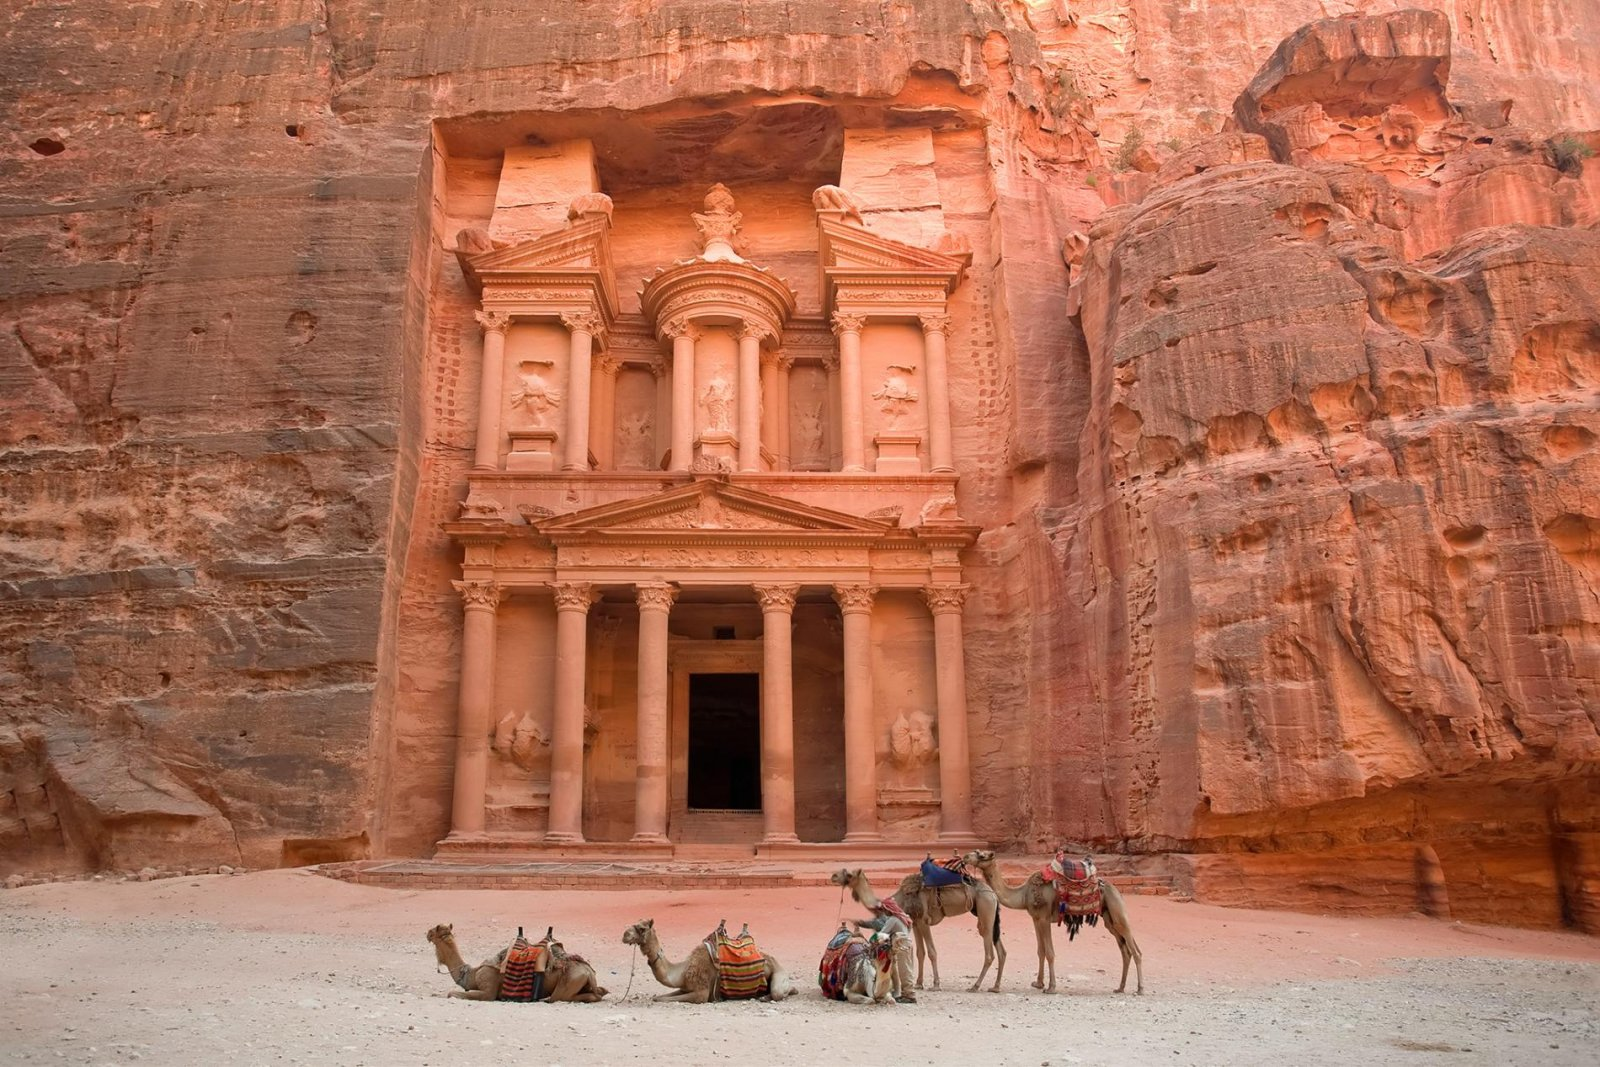 Петра (Иордания) из Шарм-эль-Шейха